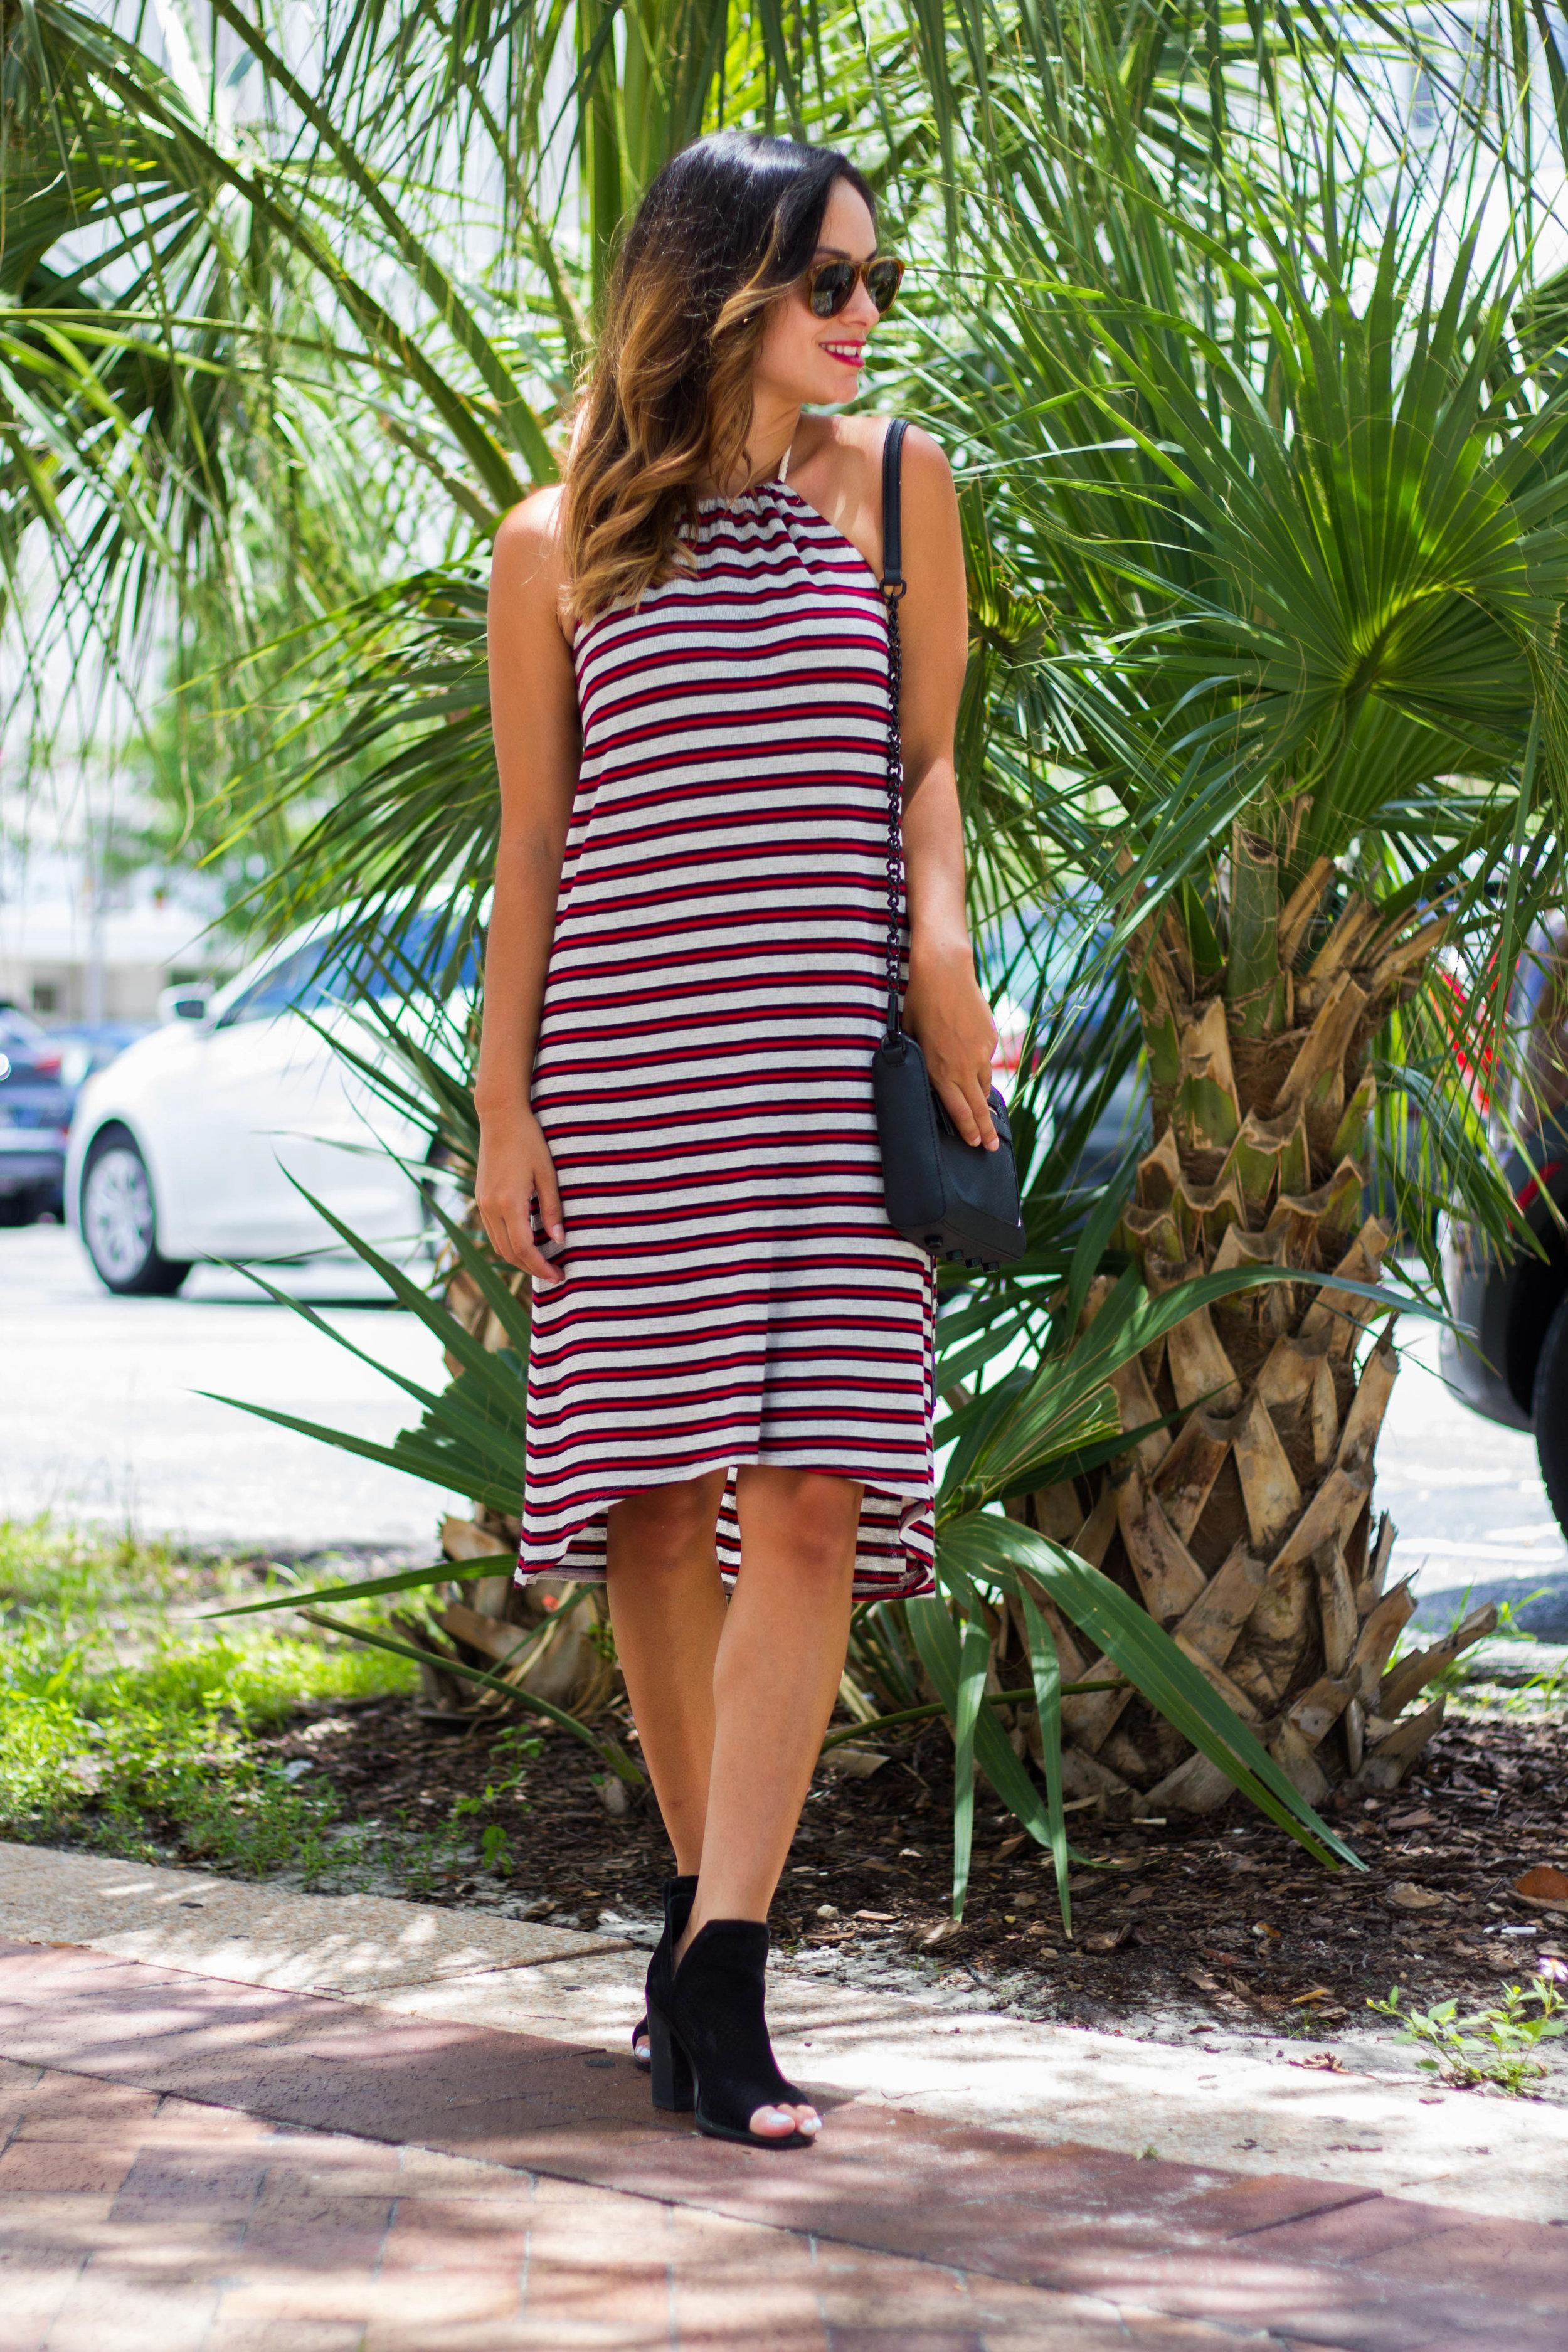 Midi Dress - Haden Reid Boutique | Photo By -  Joseph Franzese